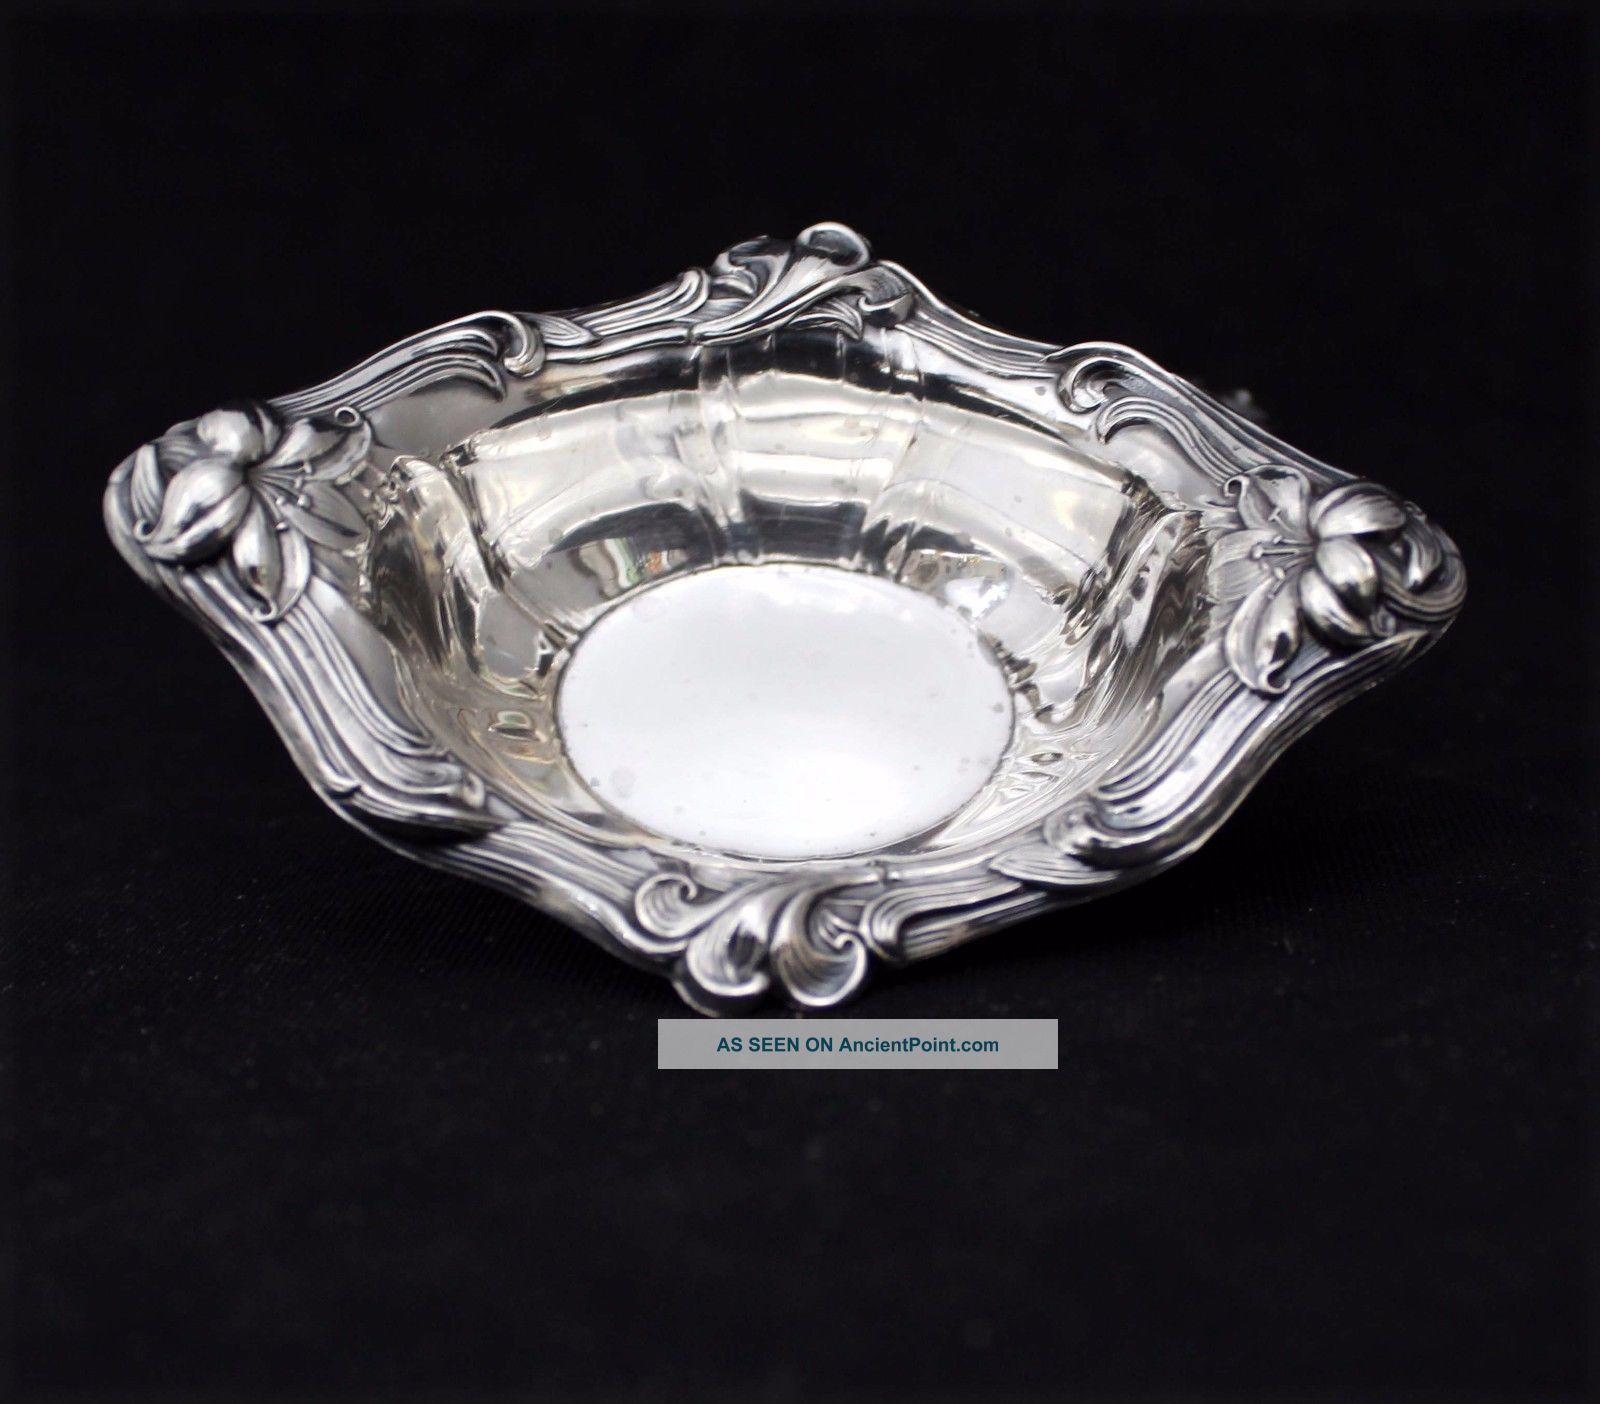 Vintage Sterling Silver Watson Co Oval Salt Cellars Nut Bowls 48.  4 G Nr Bowls photo